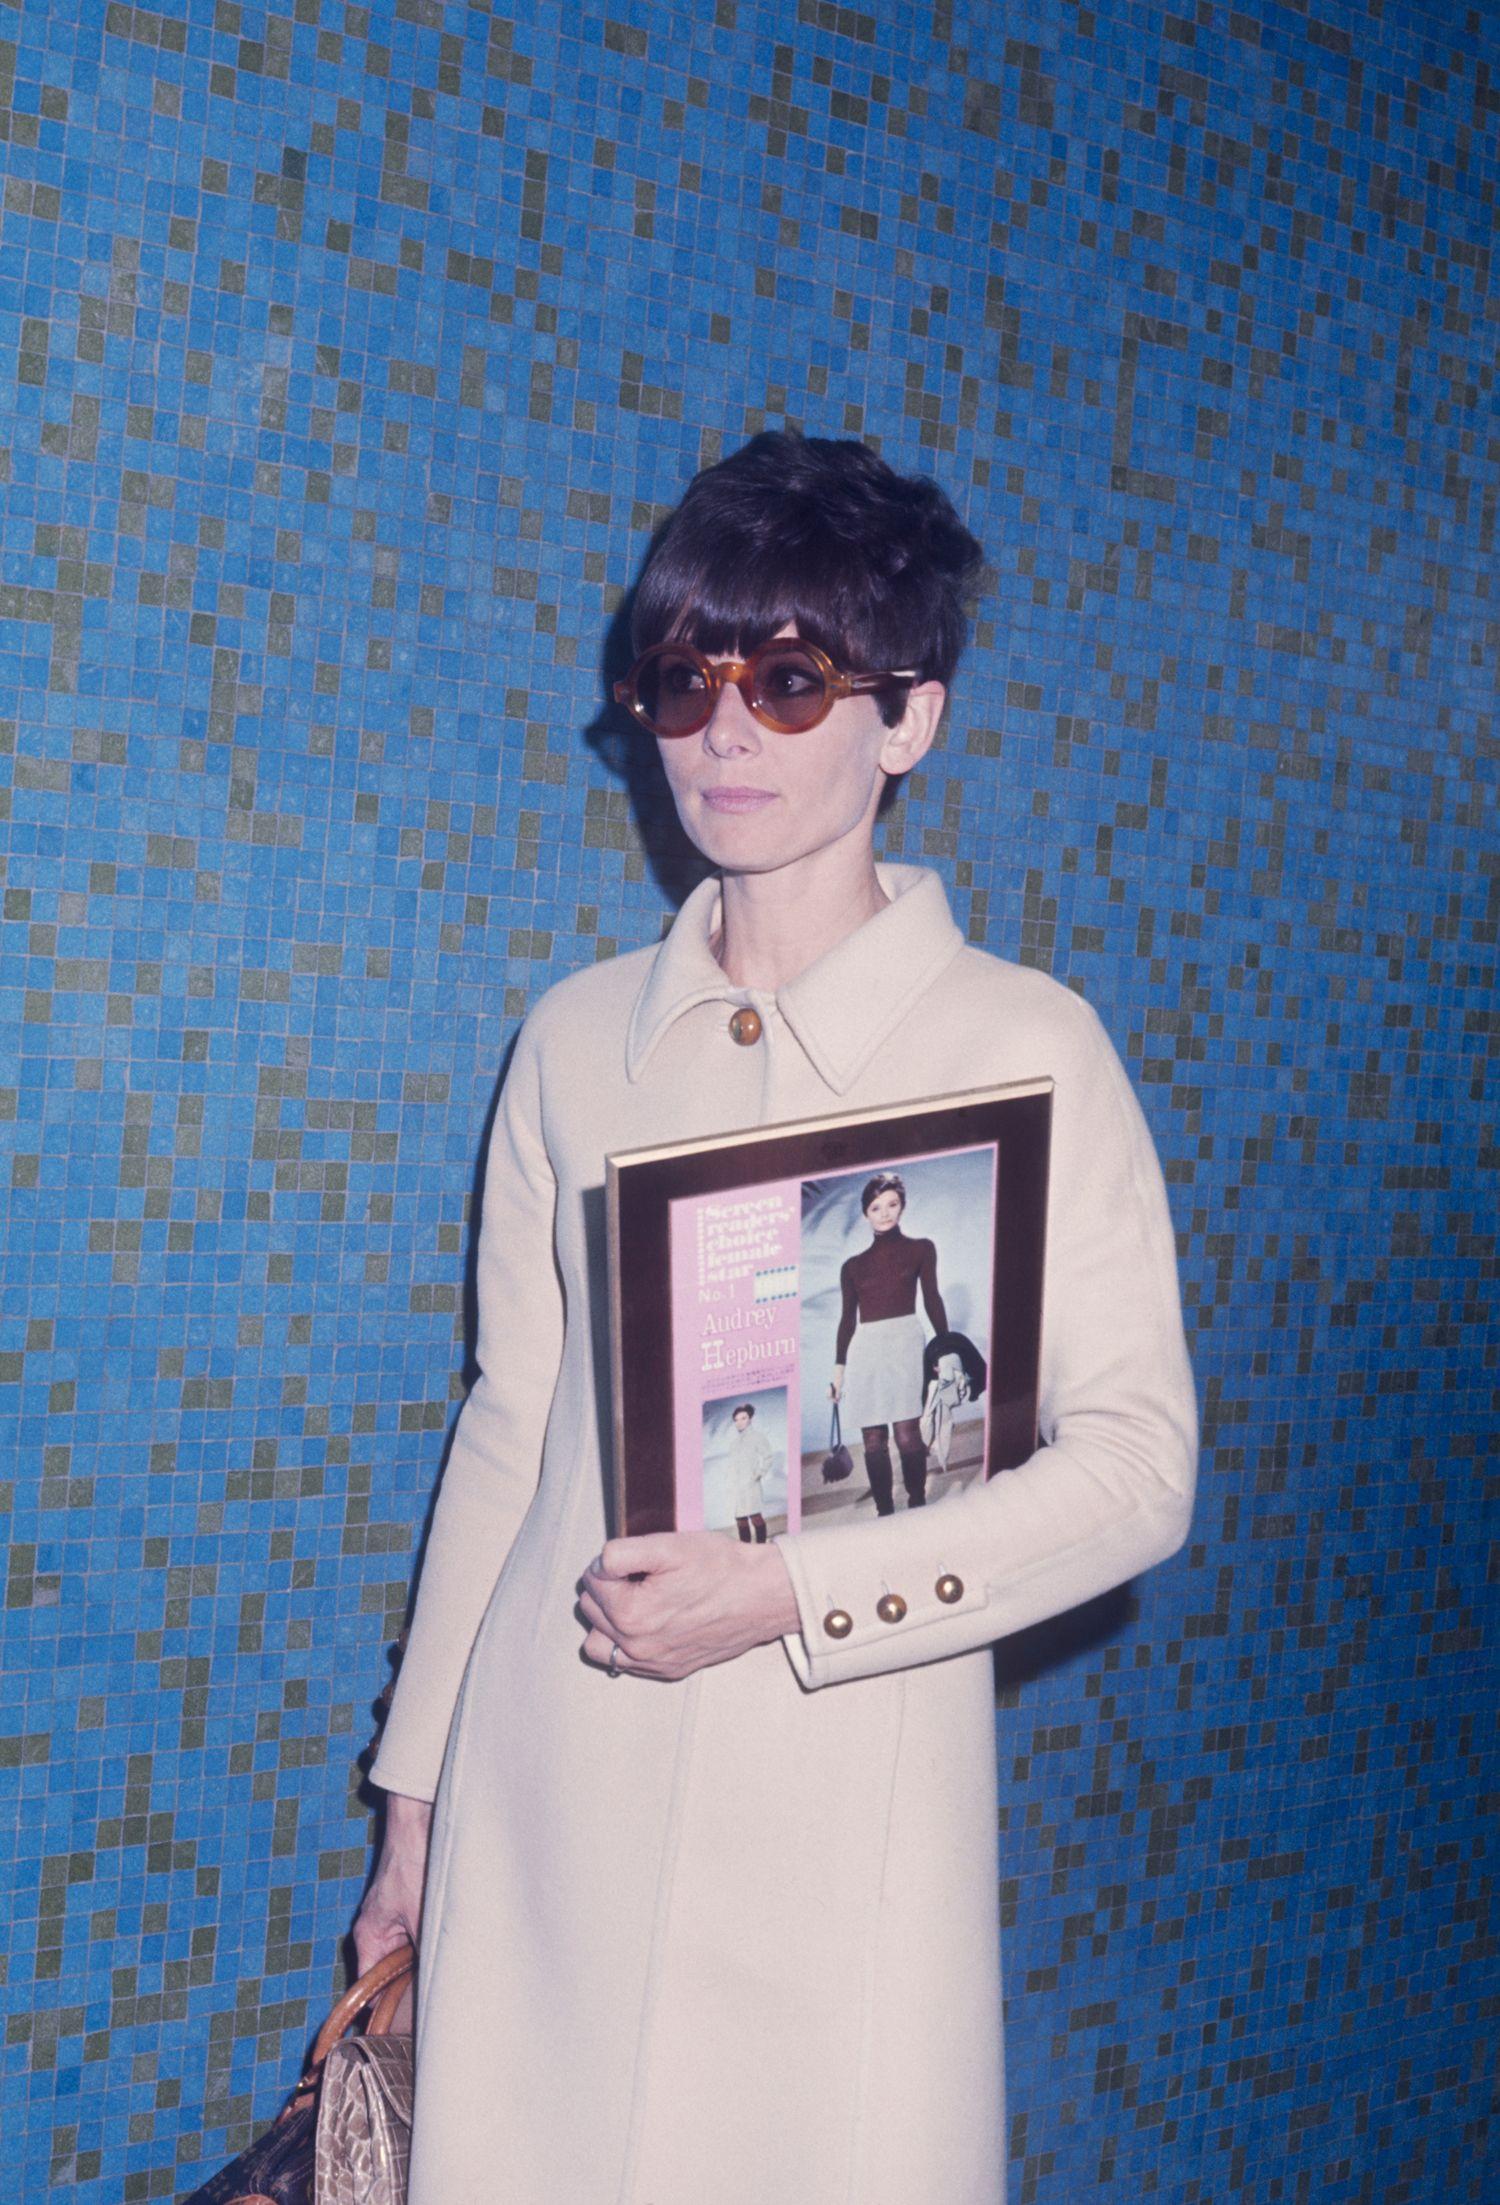 e33ecca6f5 27 Rare Vintage Photos of Audrey Hepburn — Audrey Hepburn Through the Years